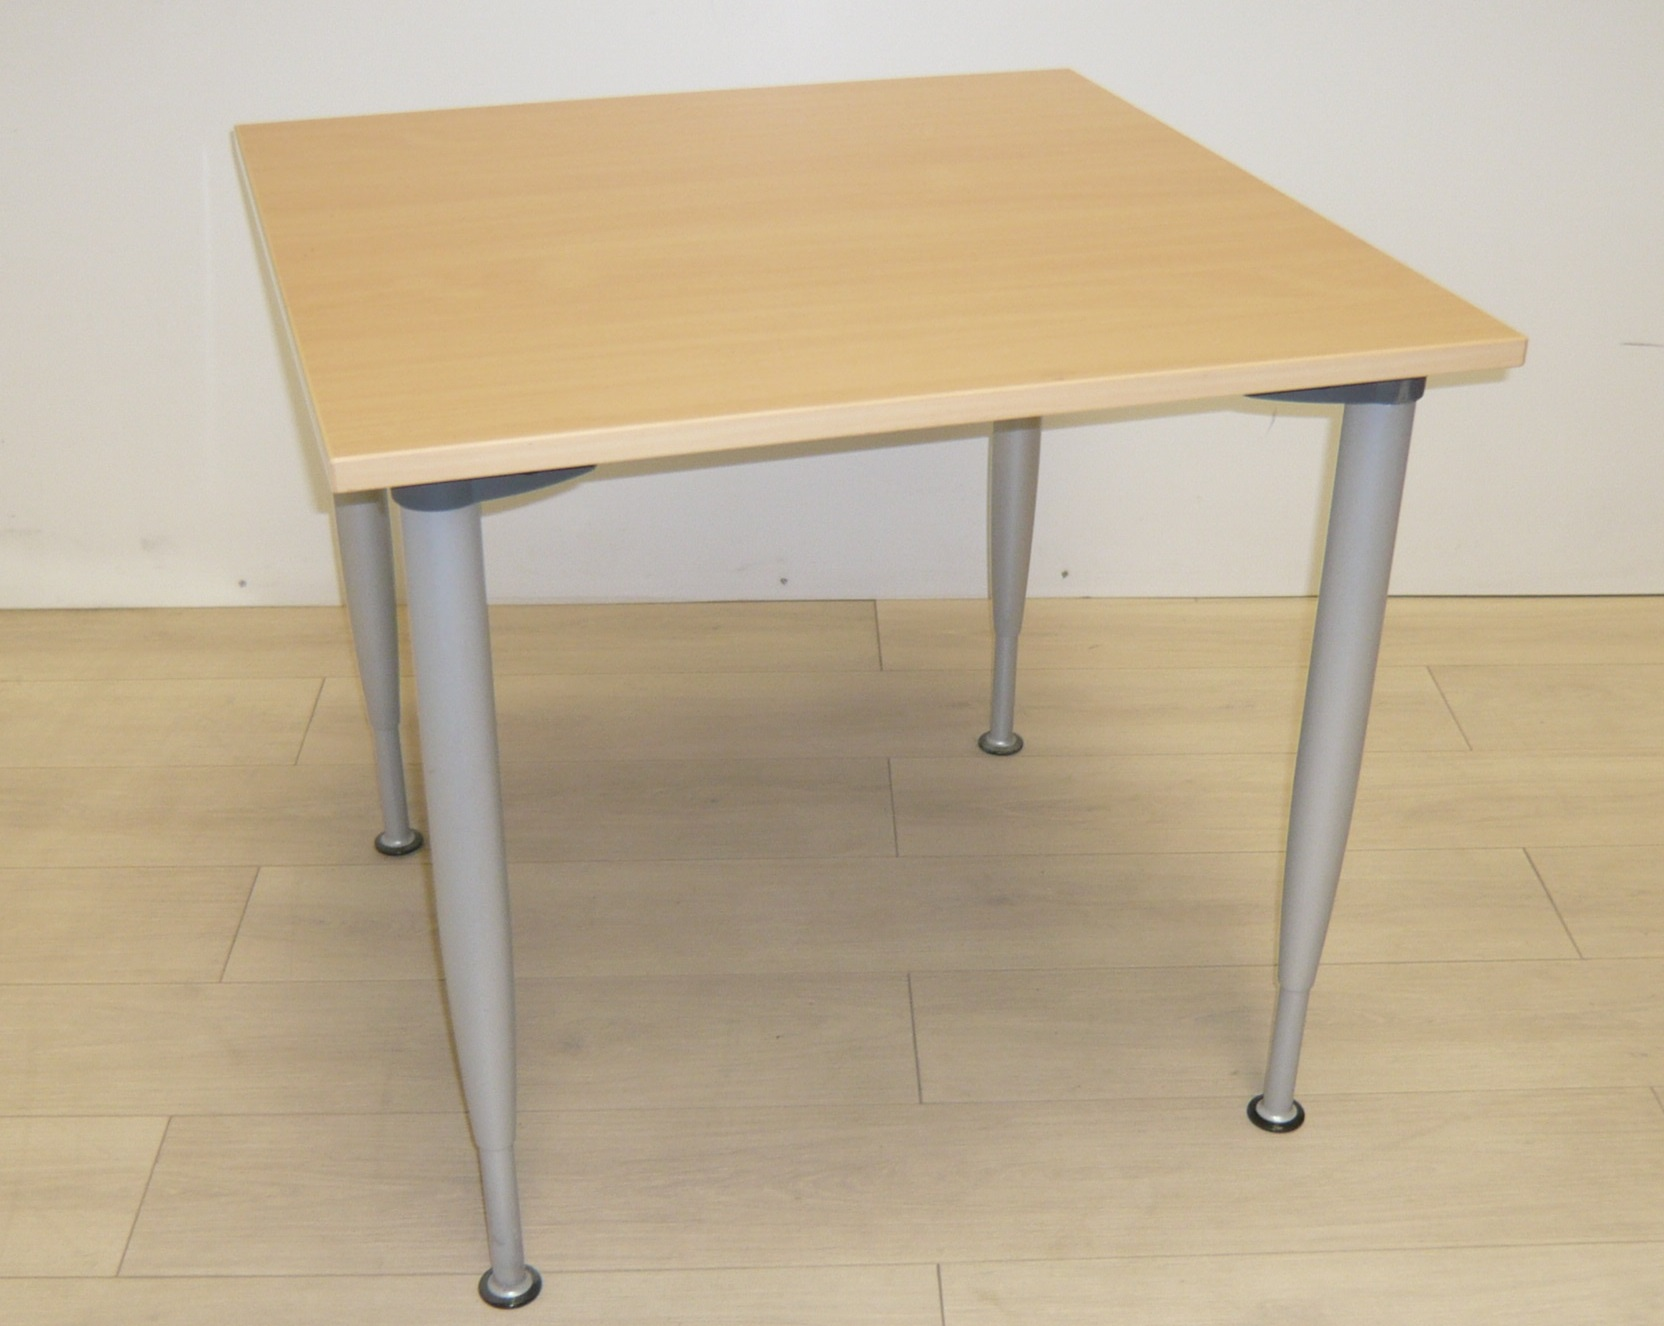 table h tre 4 pieds 80x80 burocase. Black Bedroom Furniture Sets. Home Design Ideas